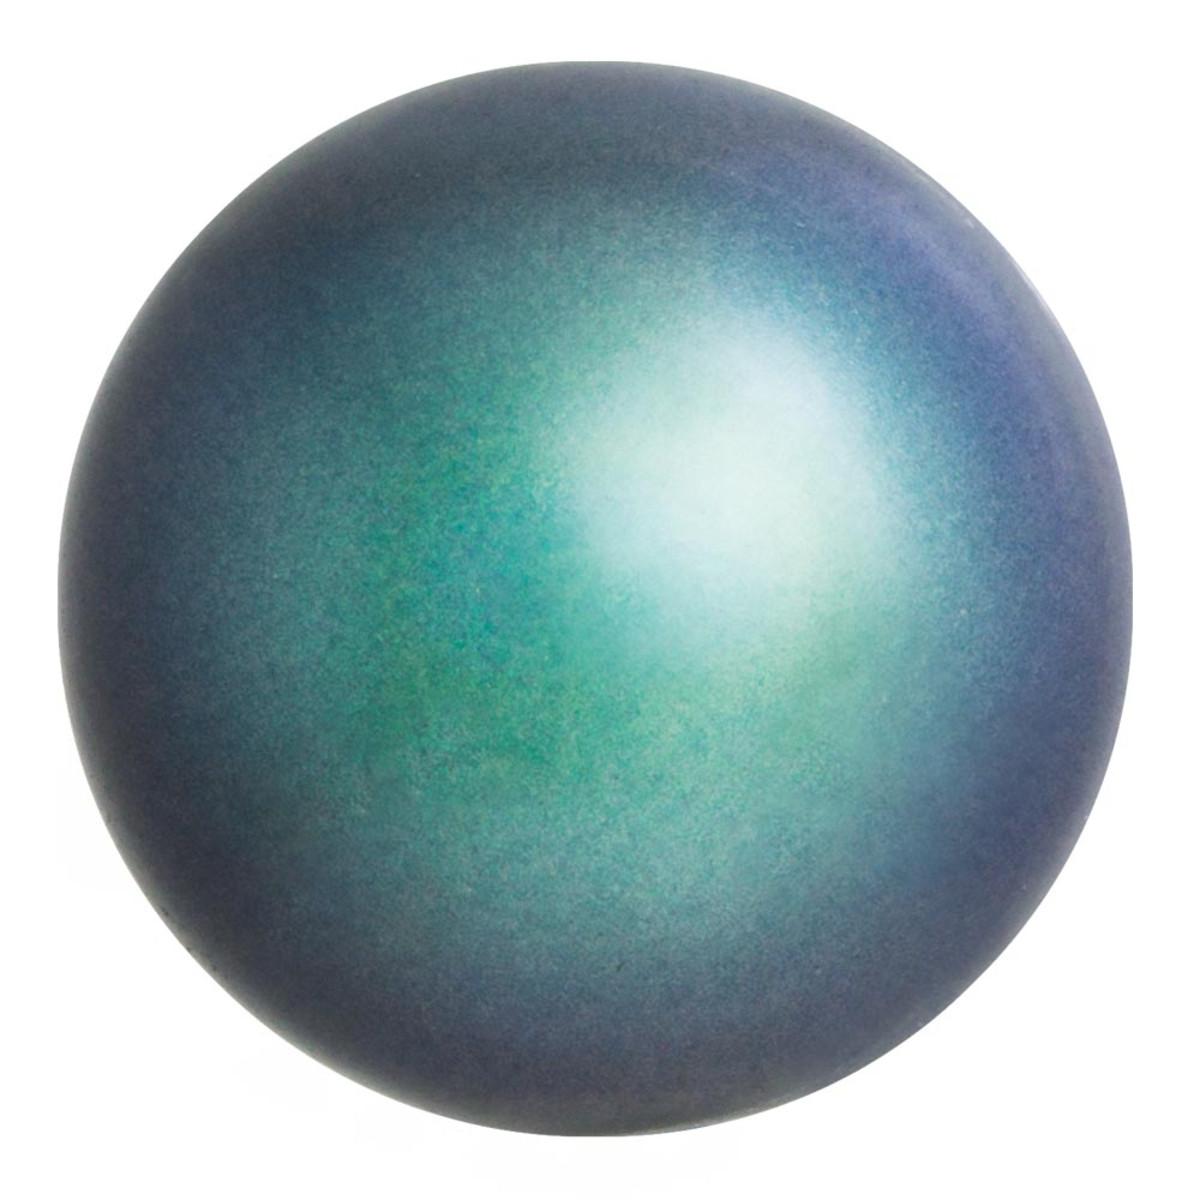 Swarovski Elements Perlen Crystal Pearls 8mm Iridescent Tahitien Look Pearls 50 Stück